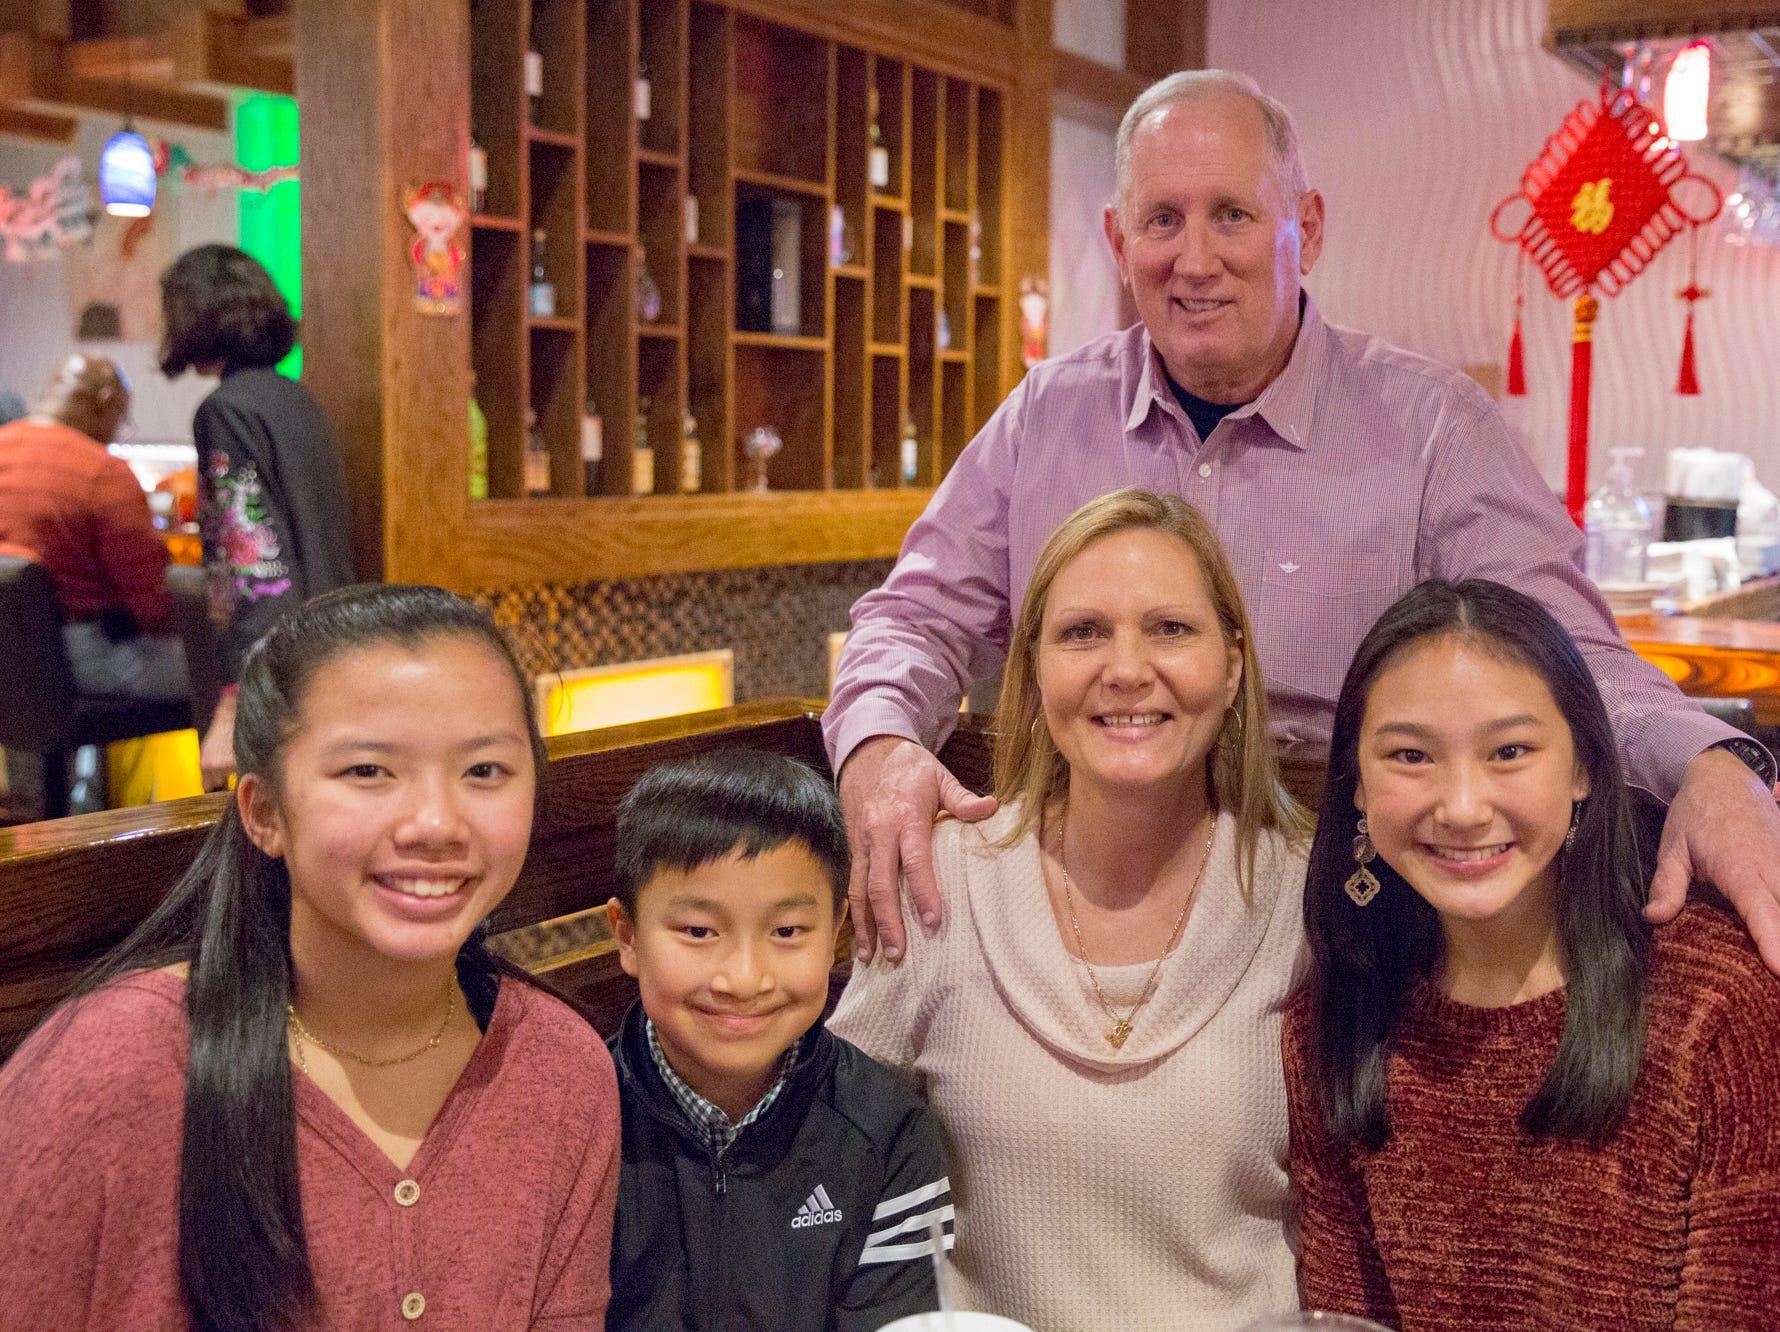 Emily Gill, 16  John Gill, 11, Rosemary and Joe Gill, Caitlin Gill 14